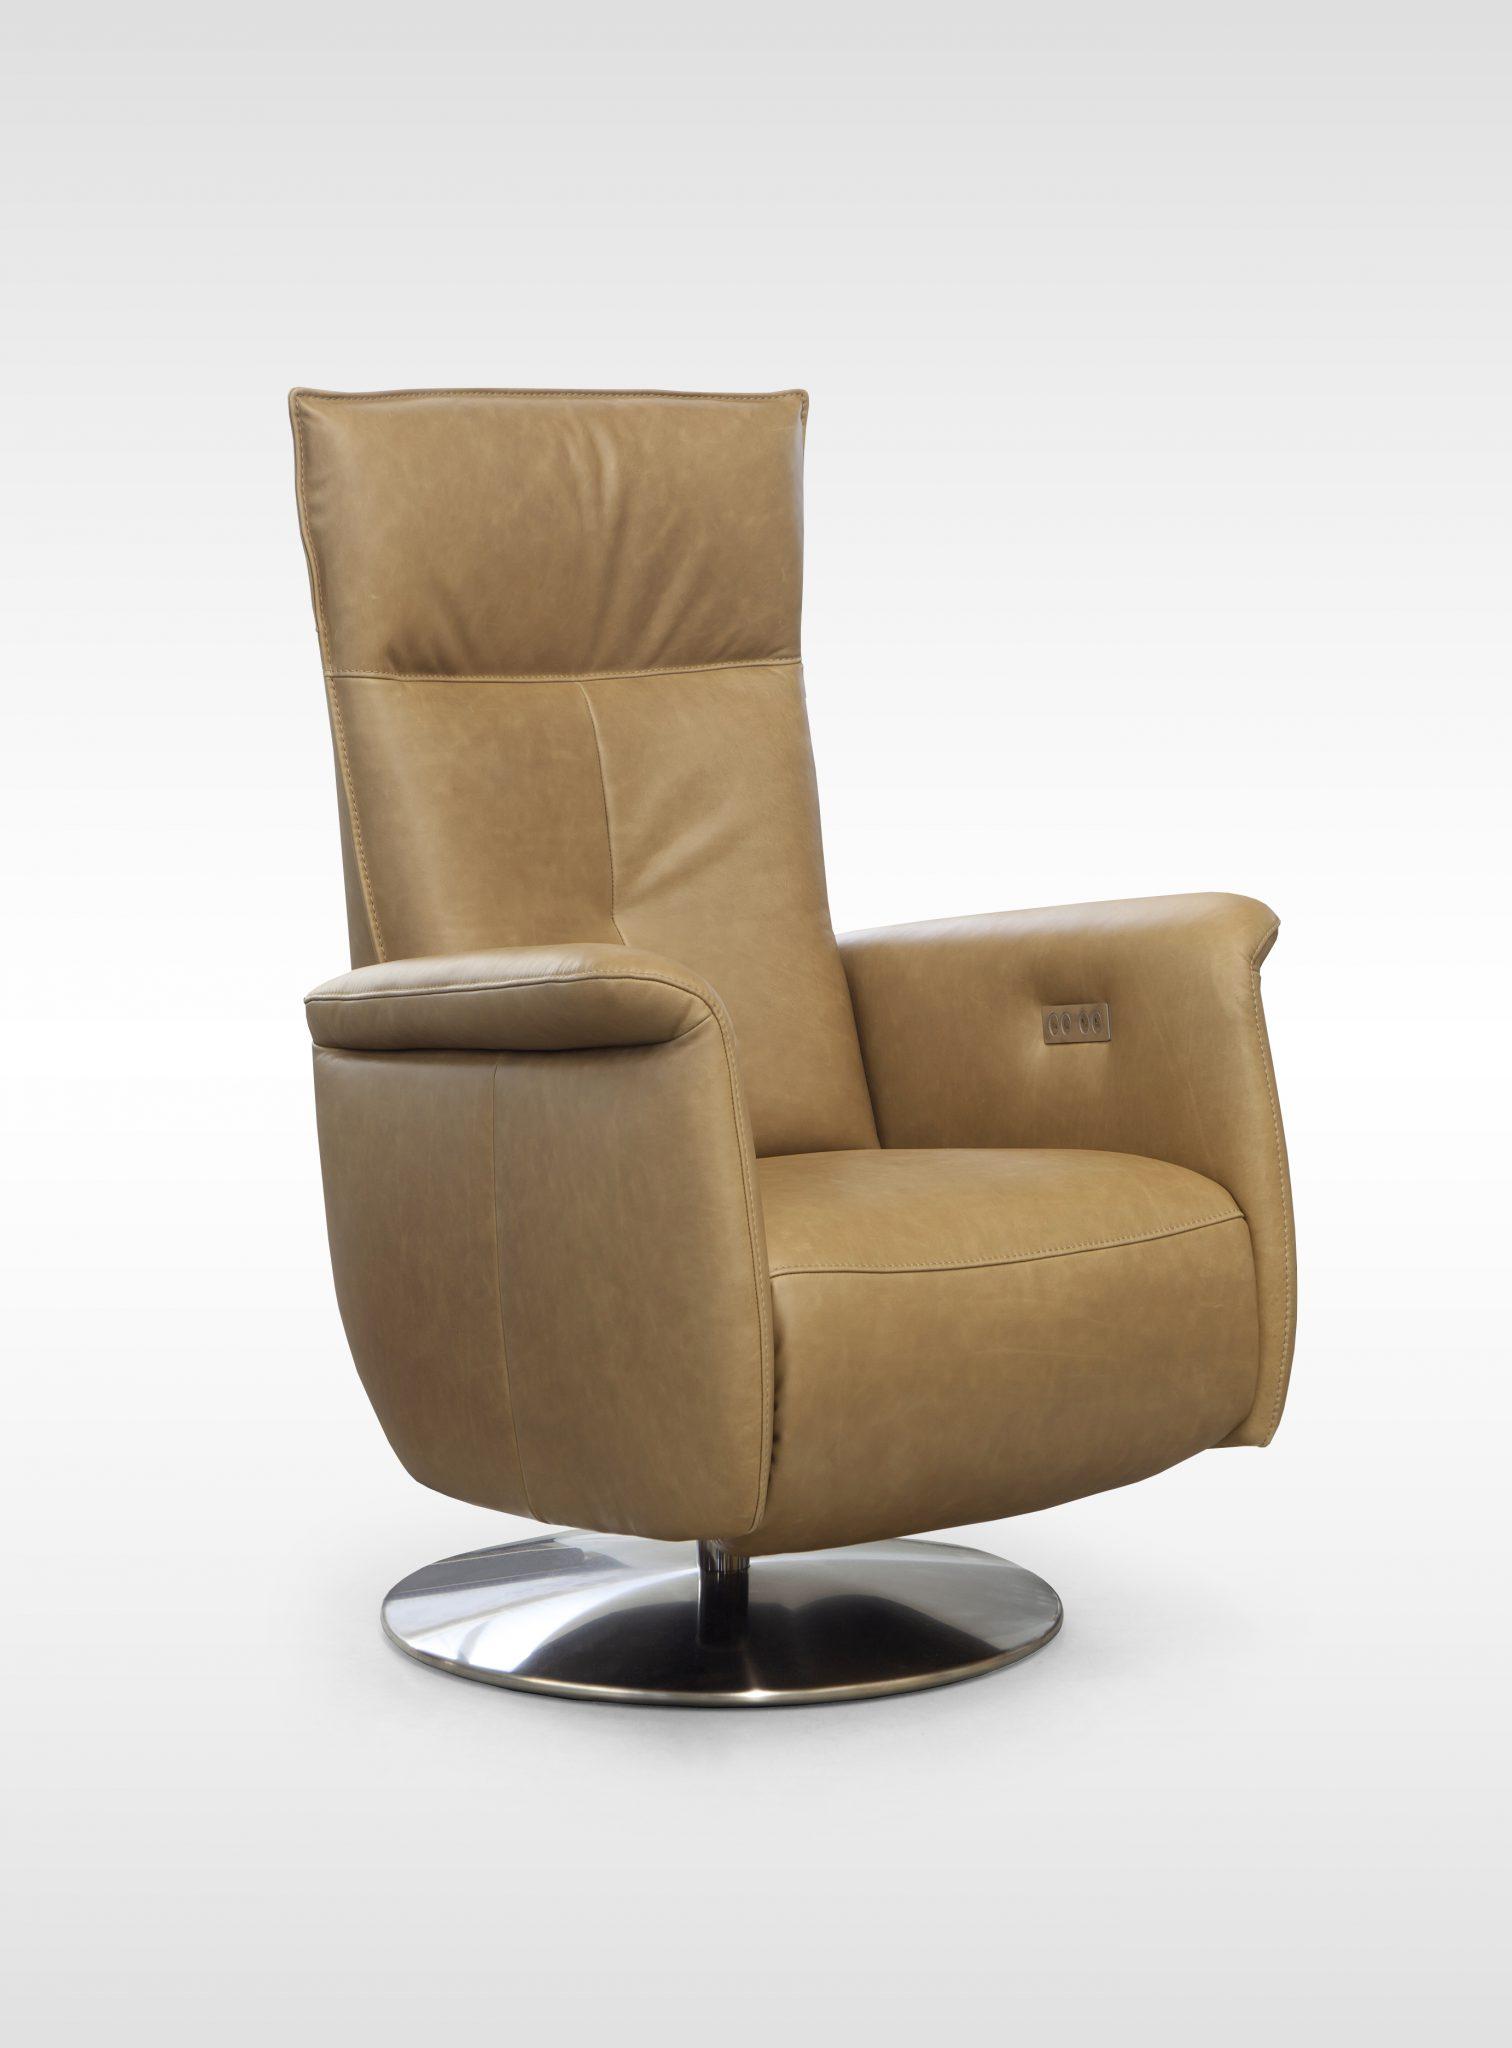 Sta op stoel Mecam Barney Elegant, stijlvol, modern en